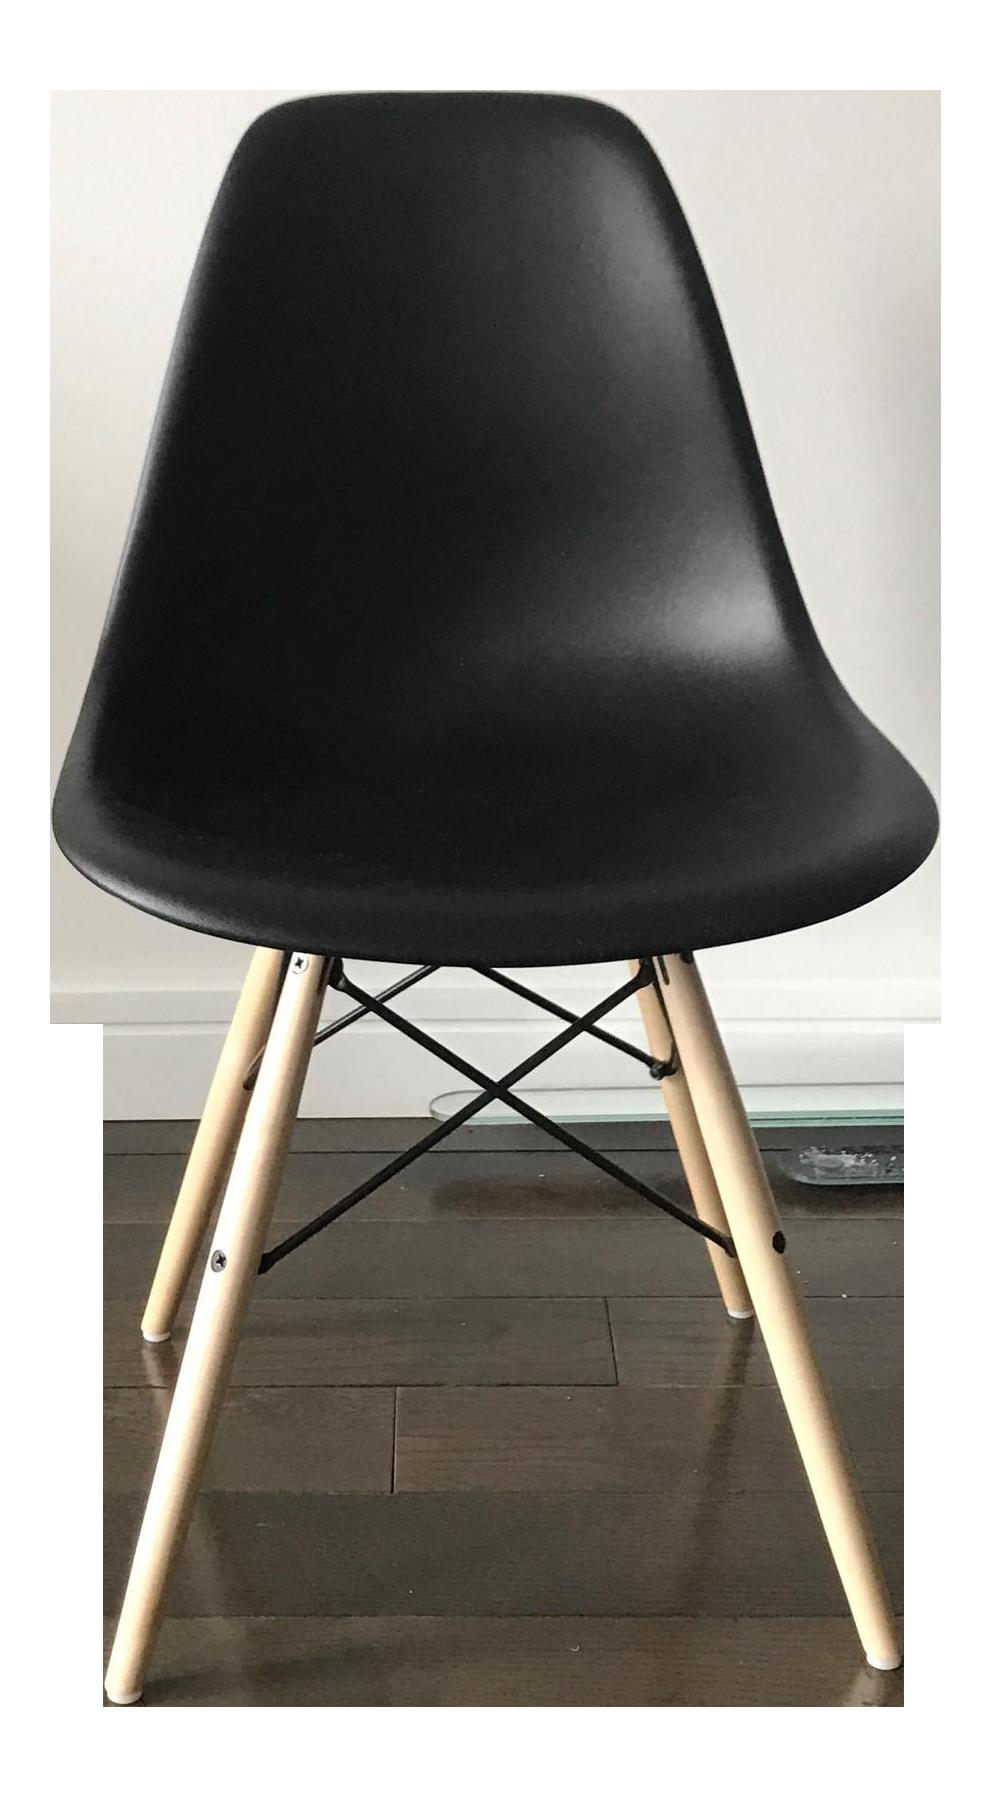 Eames molded plastic dowel leg side chair chairish for Eames dowel leg side chair